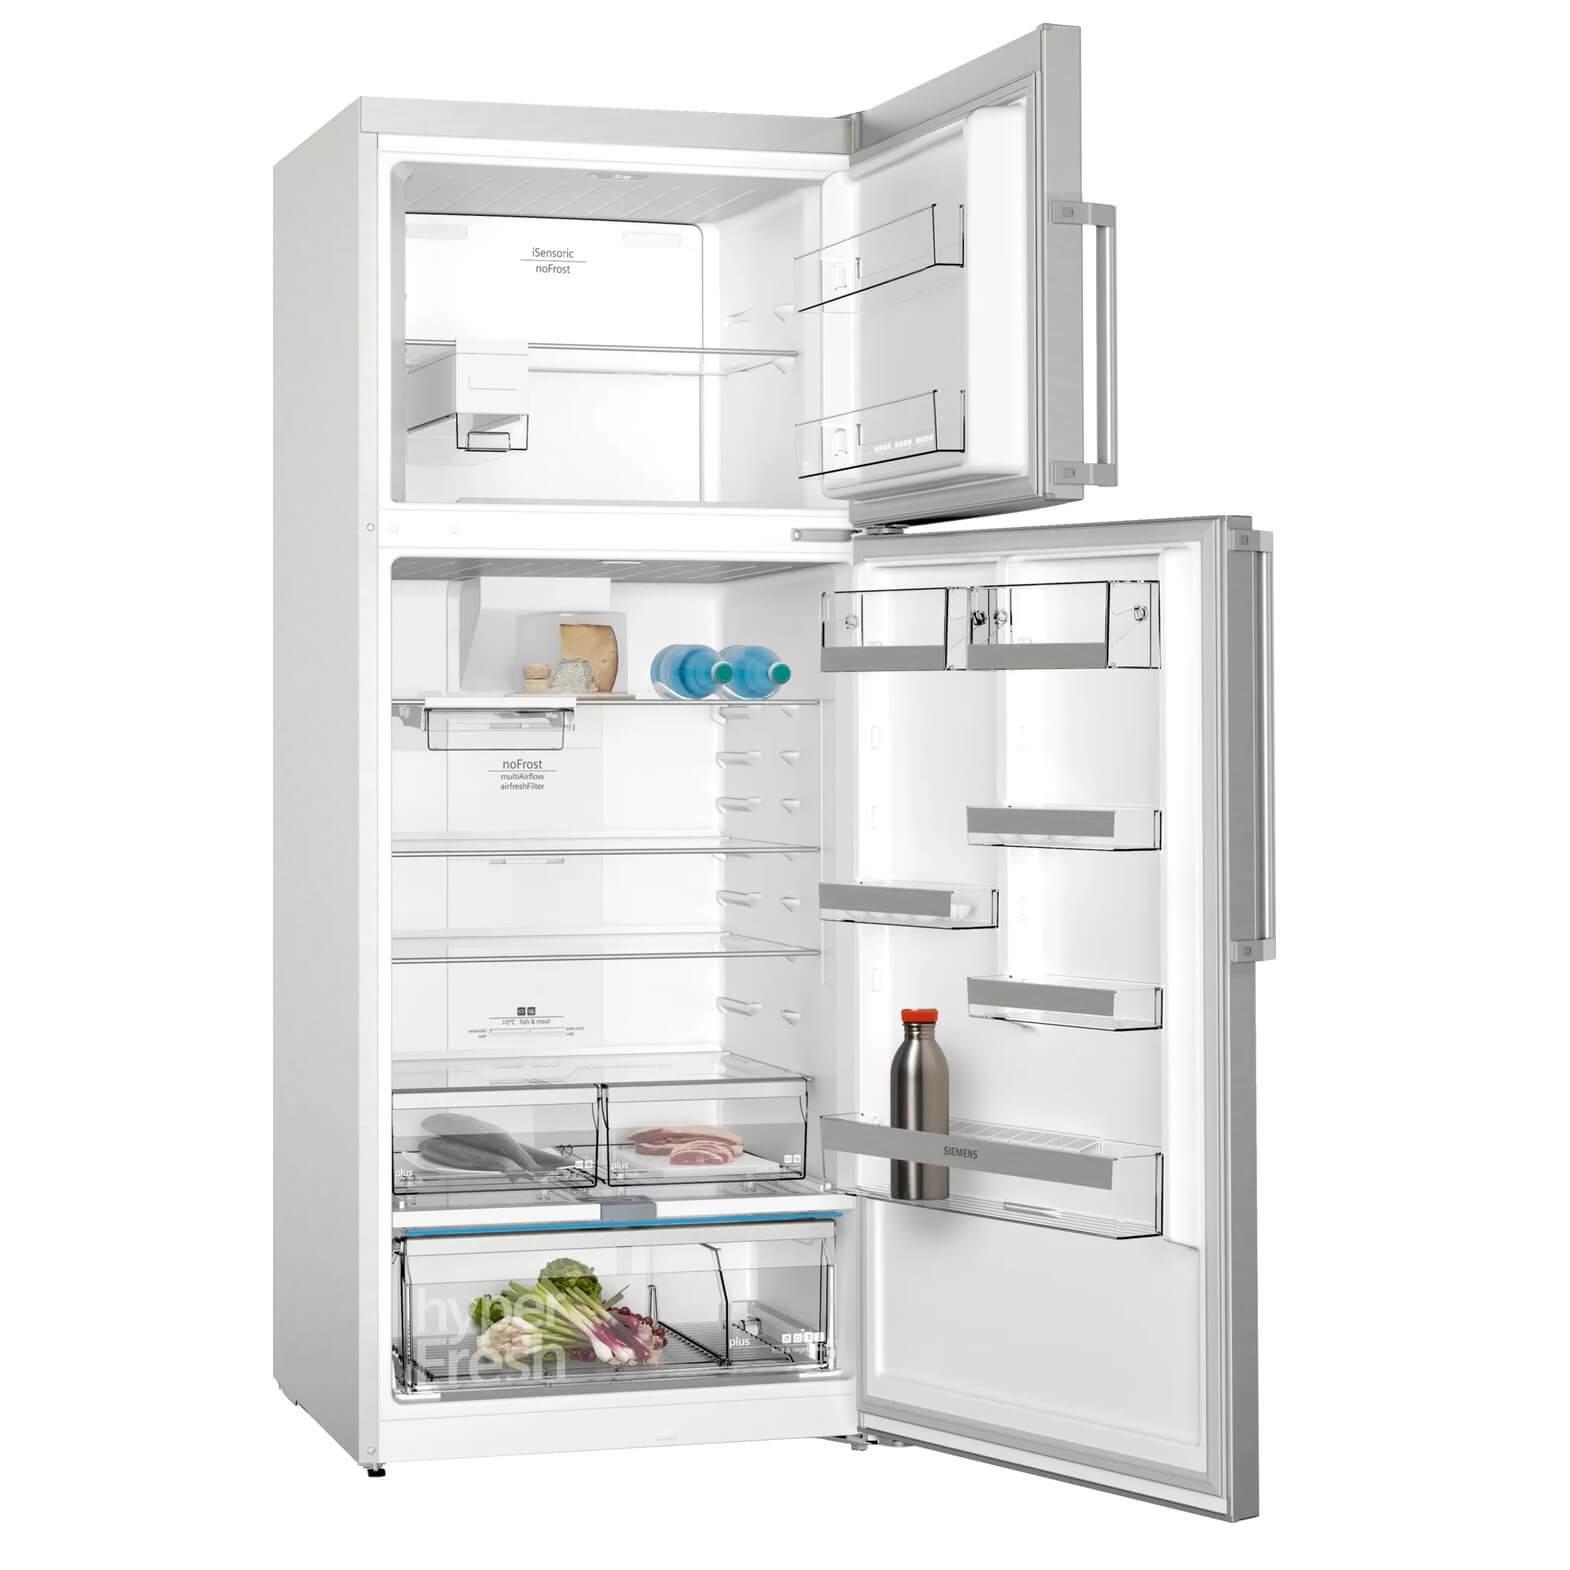 Siemens KD76NAIF0N buzdolabi